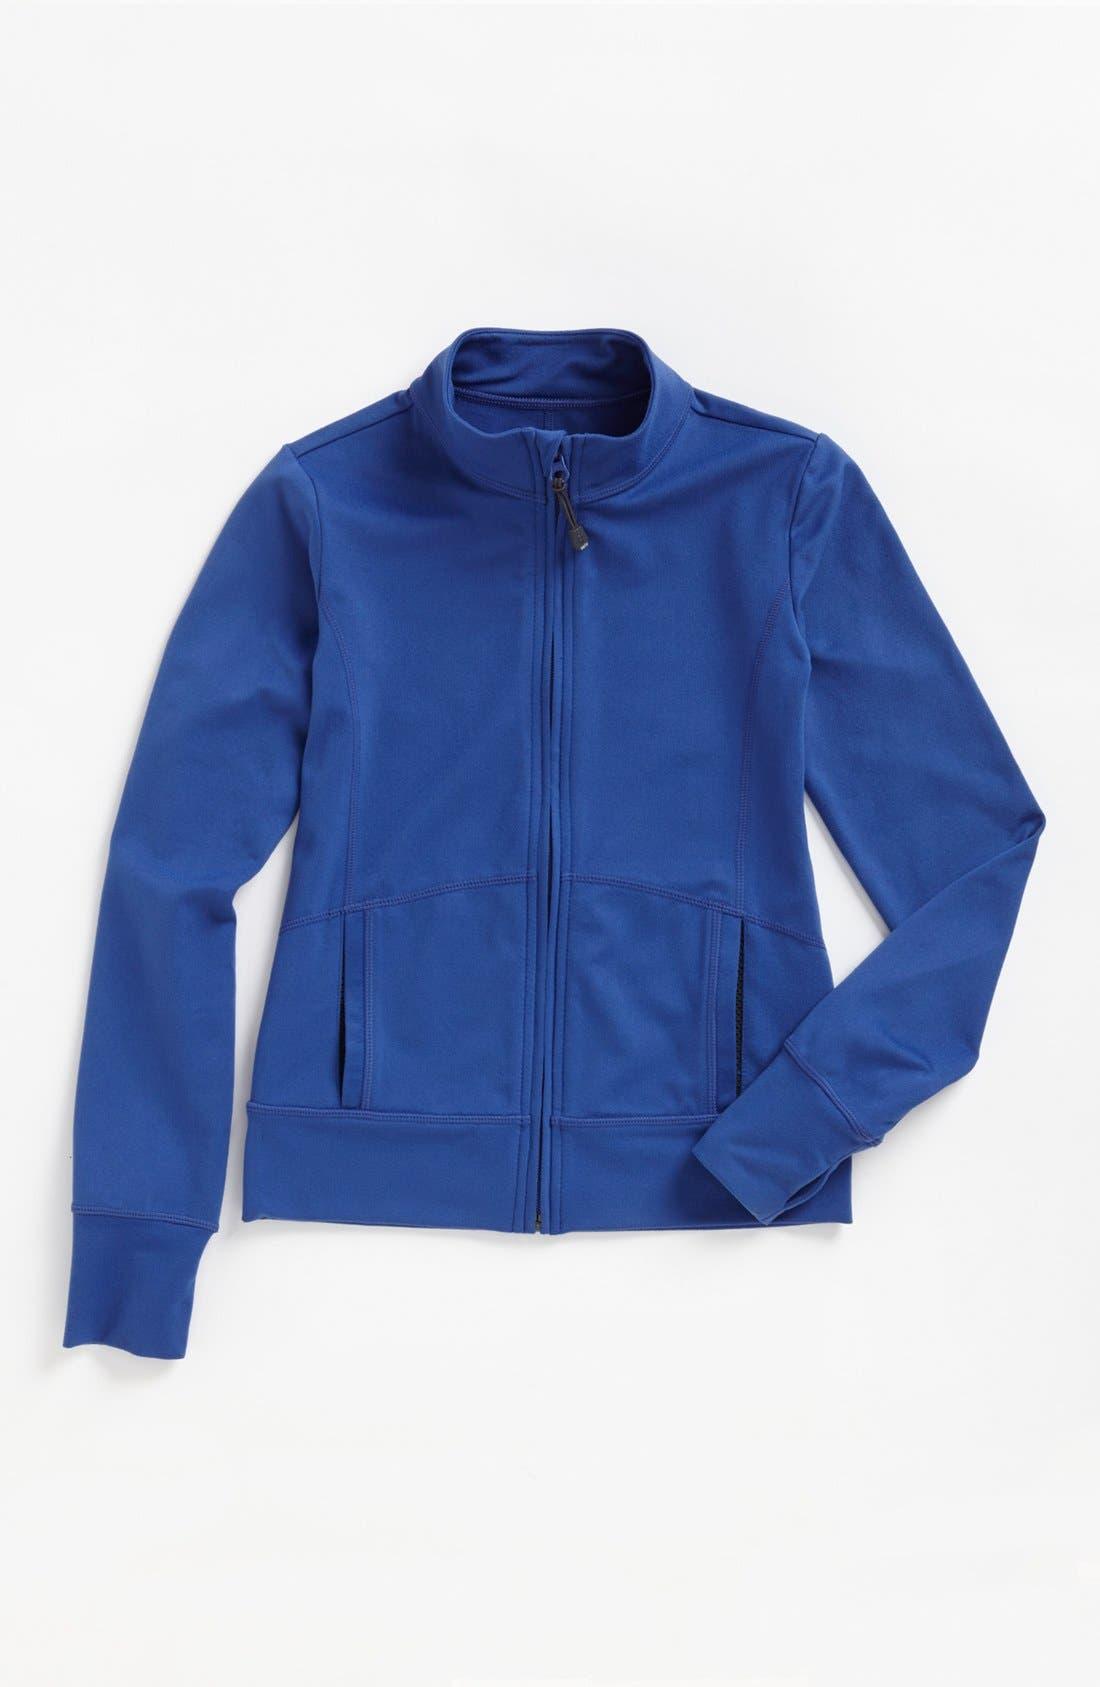 Alternate Image 1 Selected - Zella 'Everyday' Jacket (Little Girls & Big Girls)